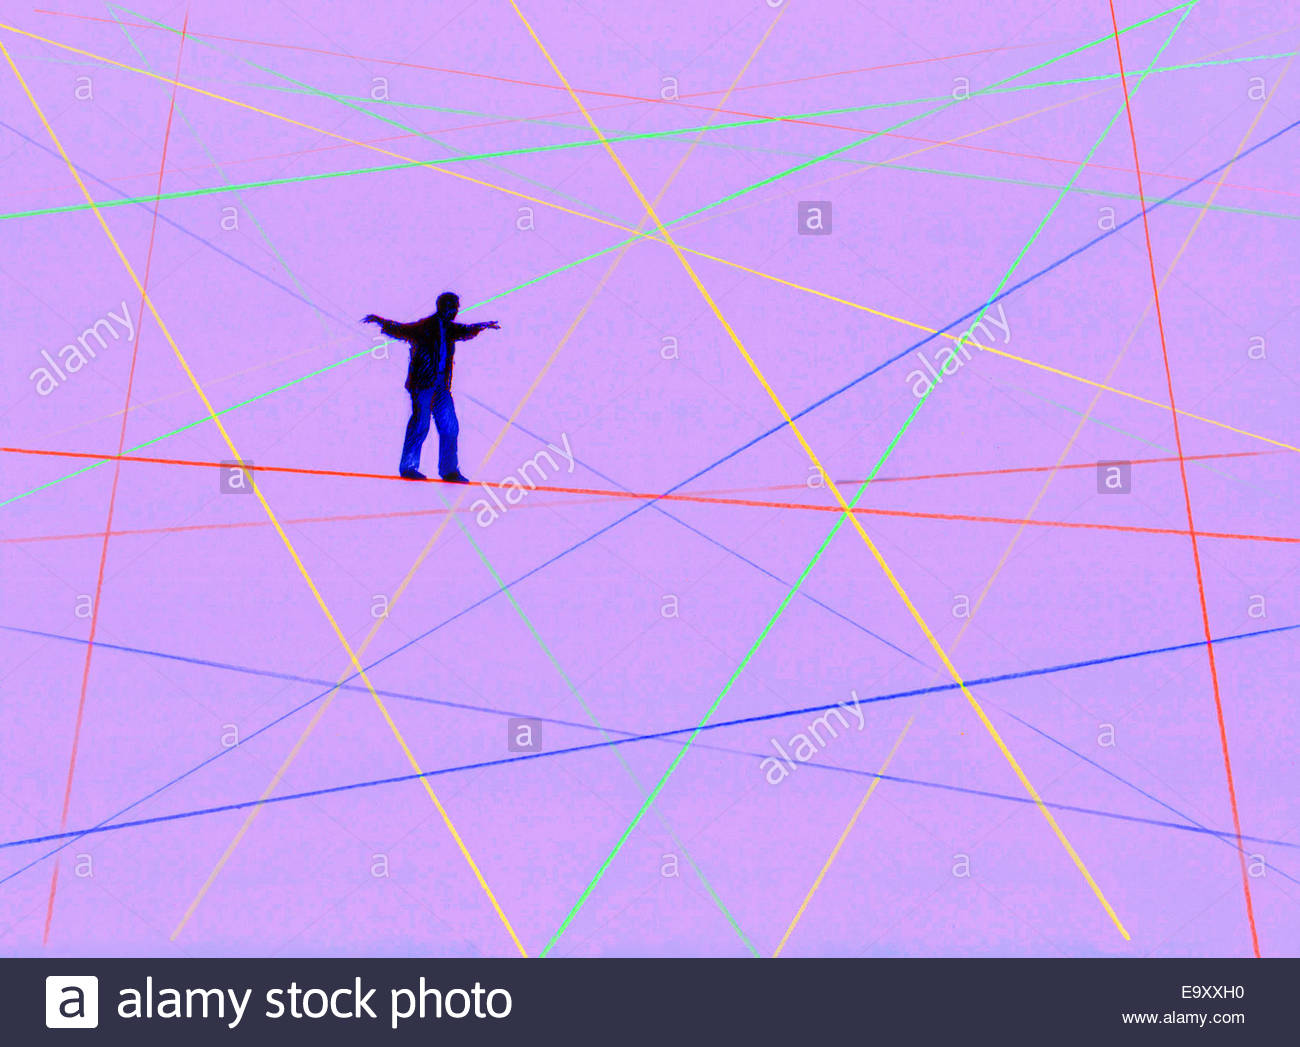 Man balancing walking on complex crisscross tightrope pattern - Stock Image